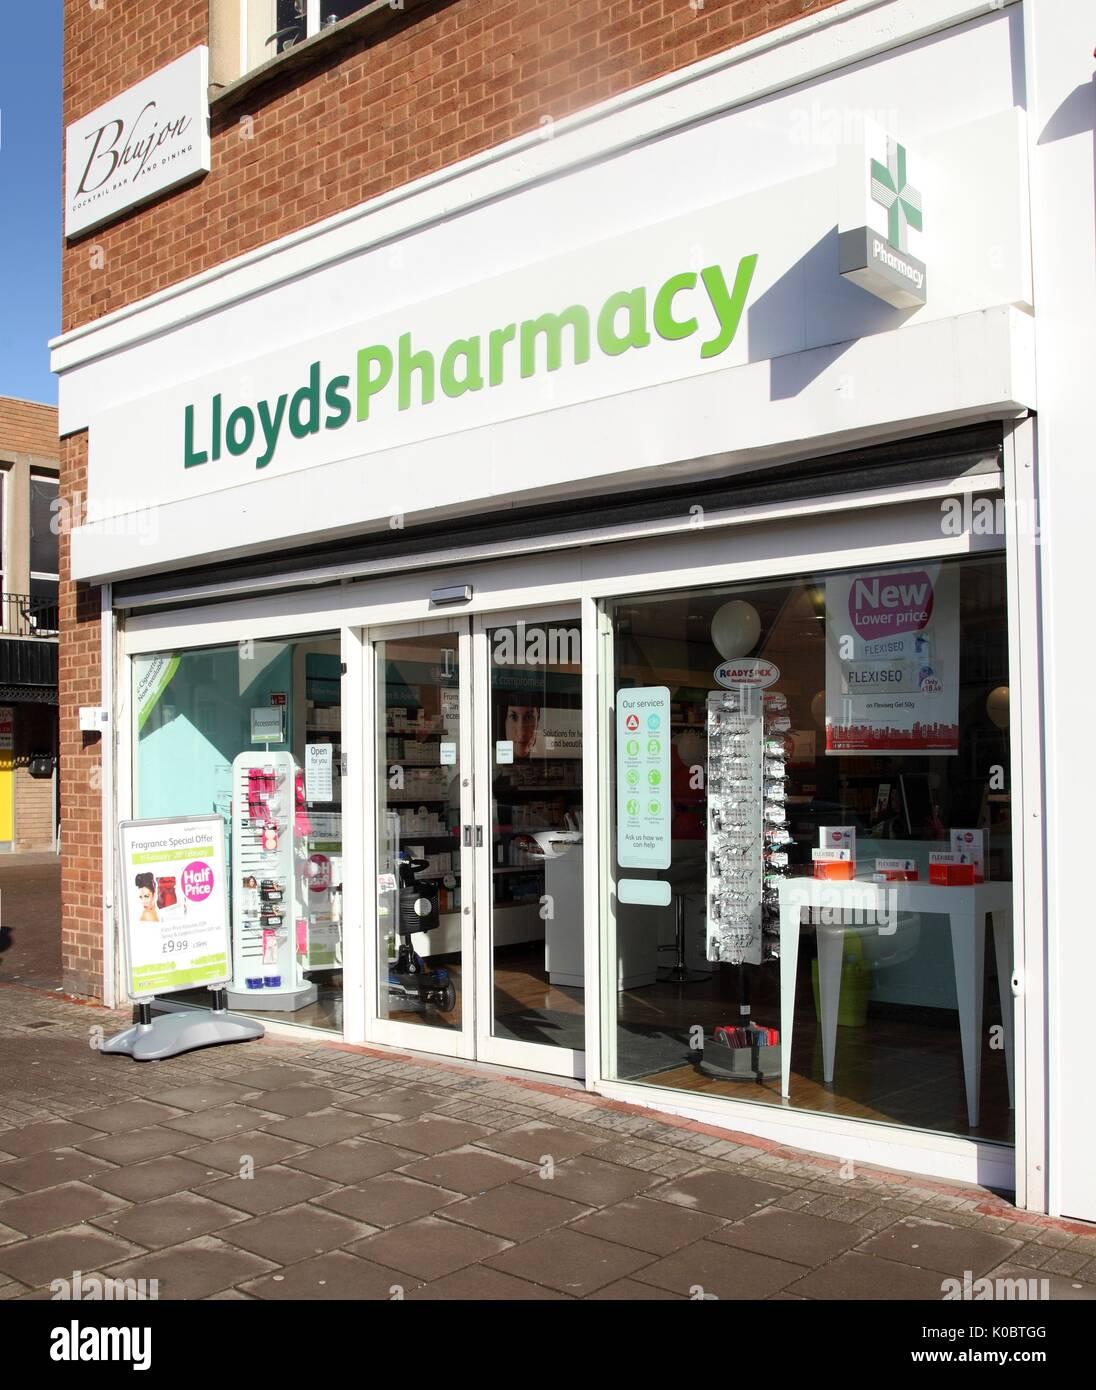 Lloyds pharmacy in Four Oaks, West Midlands, chemist shop, pharmacists, drug store exterior. - Stock Image